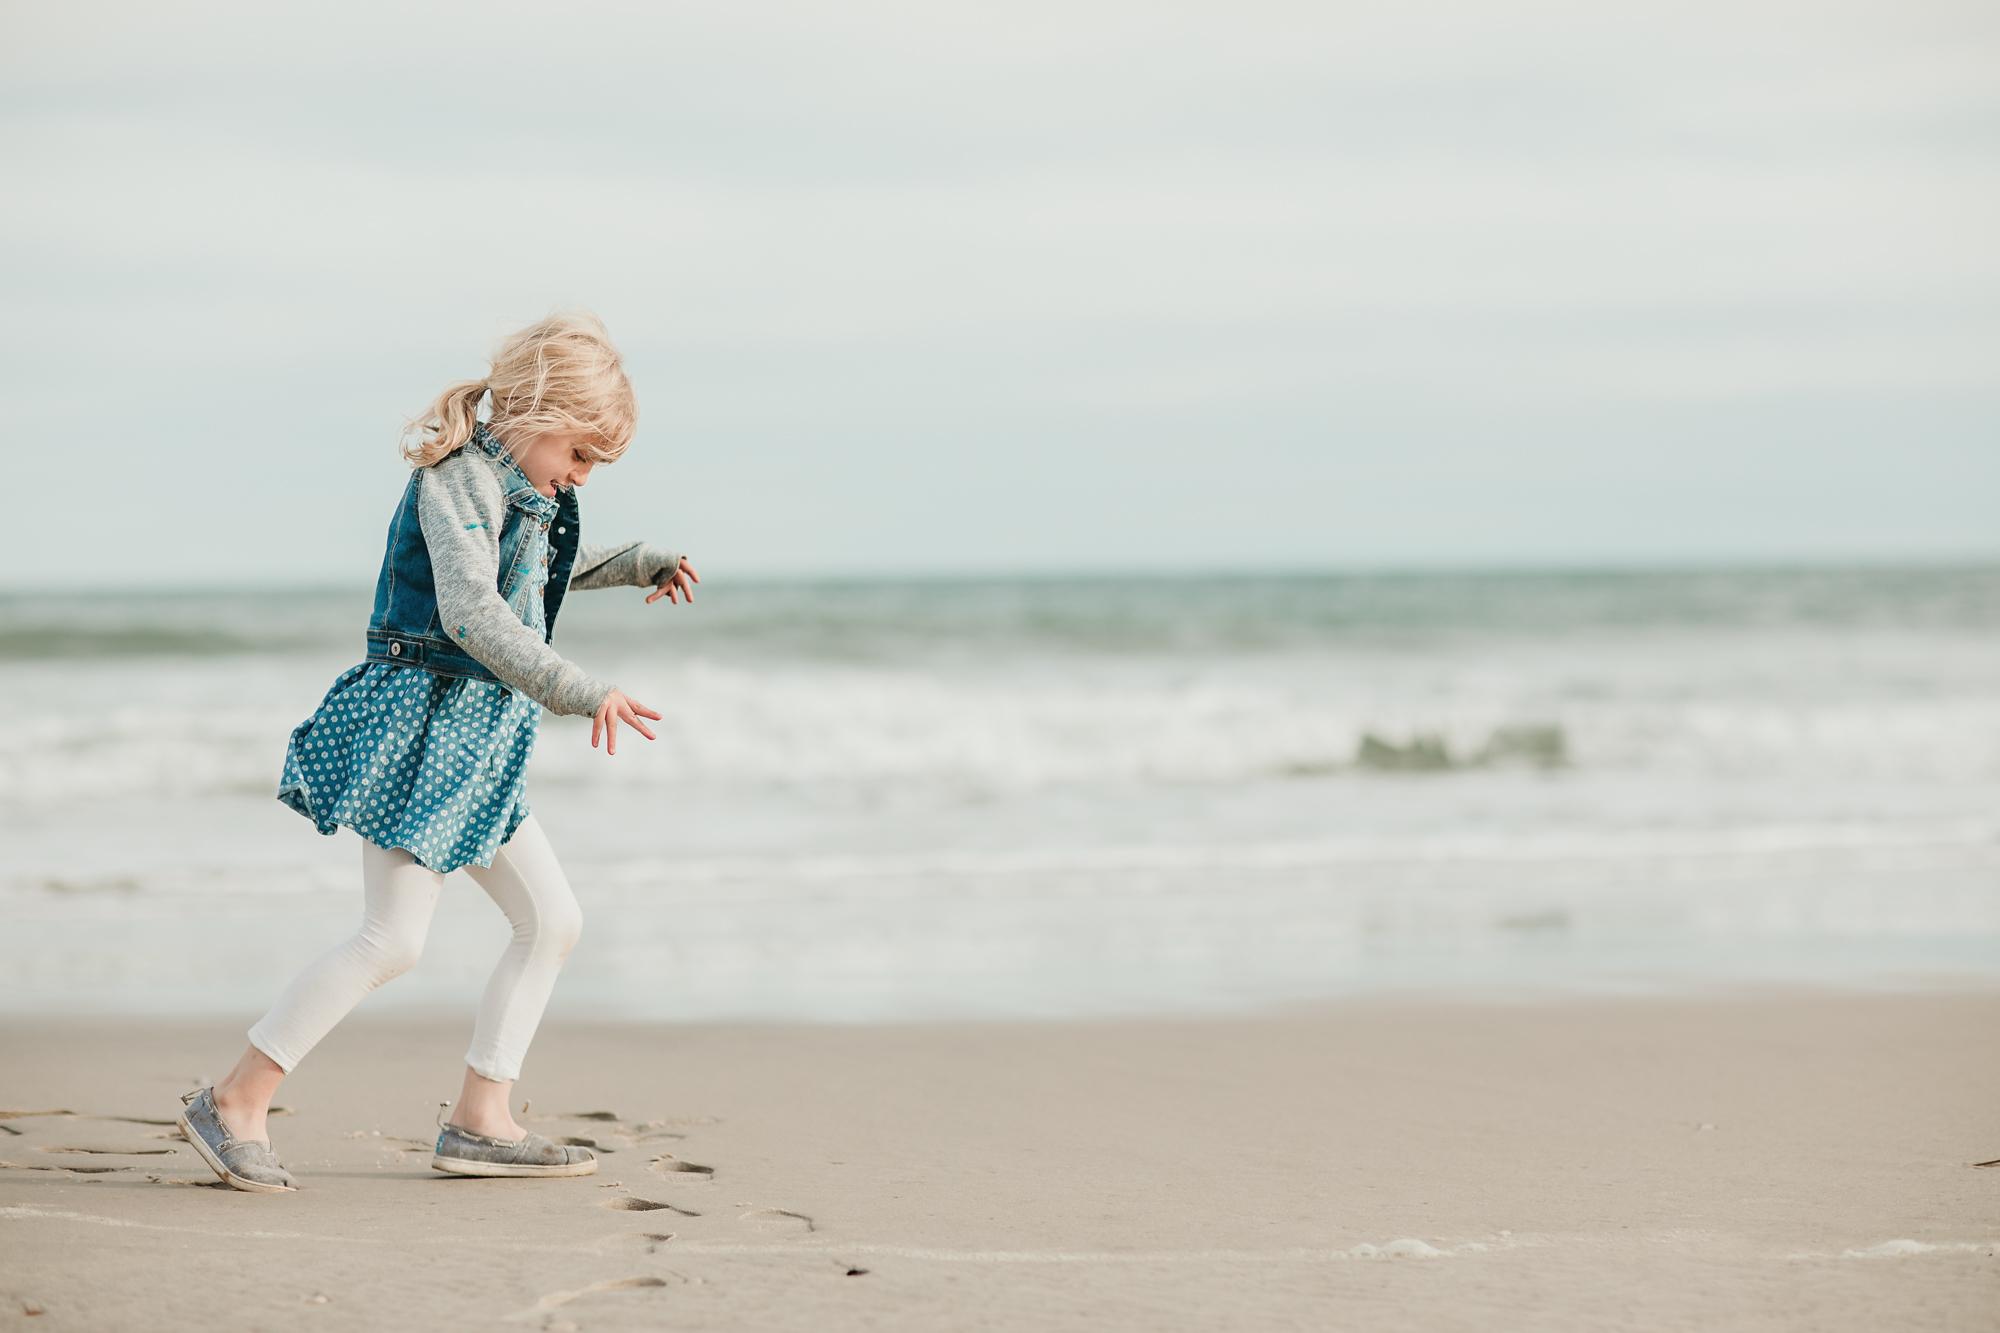 Hello-olivia-photography-Long-island-beach-session-photographer-port-jeff-montauk-fire-island-family-kids-children-7376